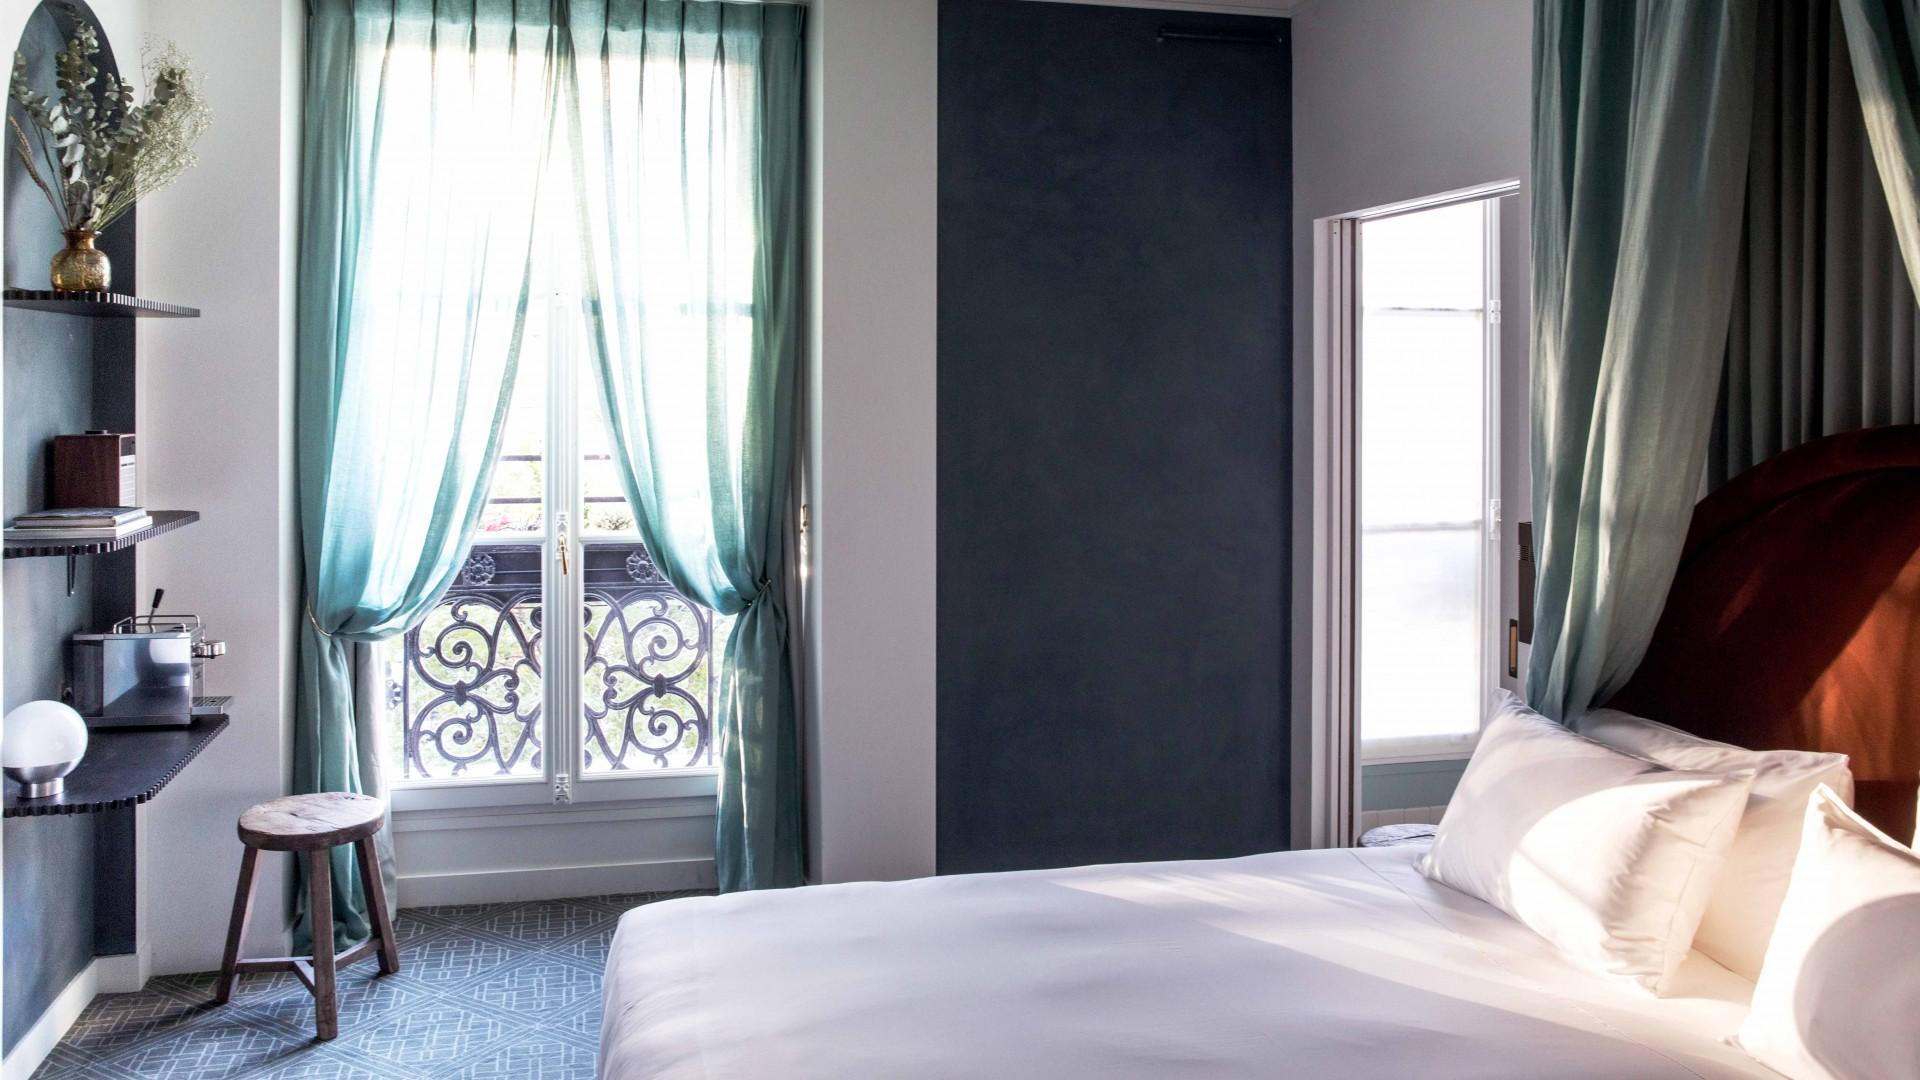 Sentier, Paris: Bedrooms at Hotel Des Grands Boulevards